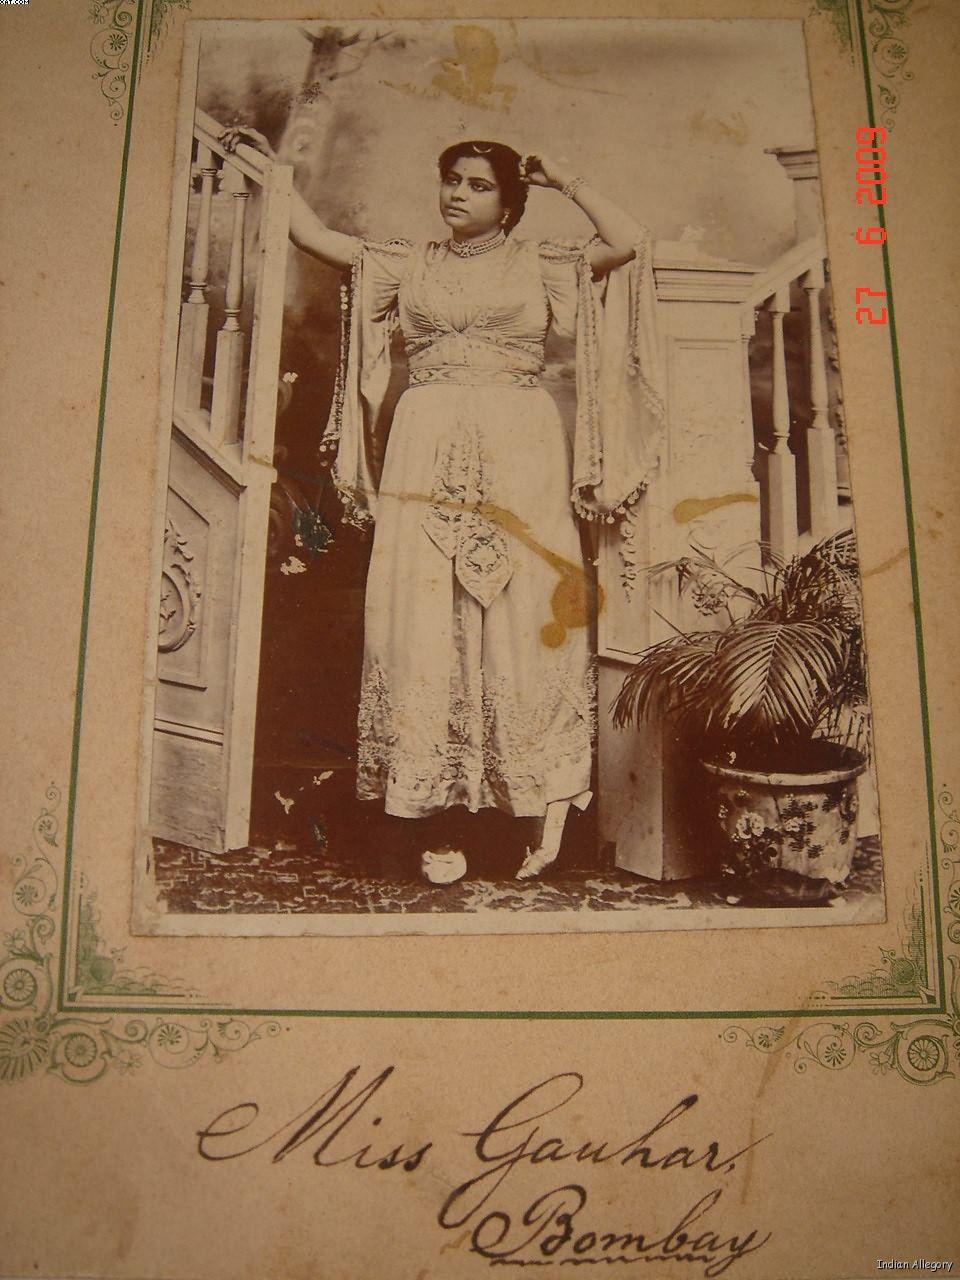 Miss Gauhar Bombay (Mumbai)